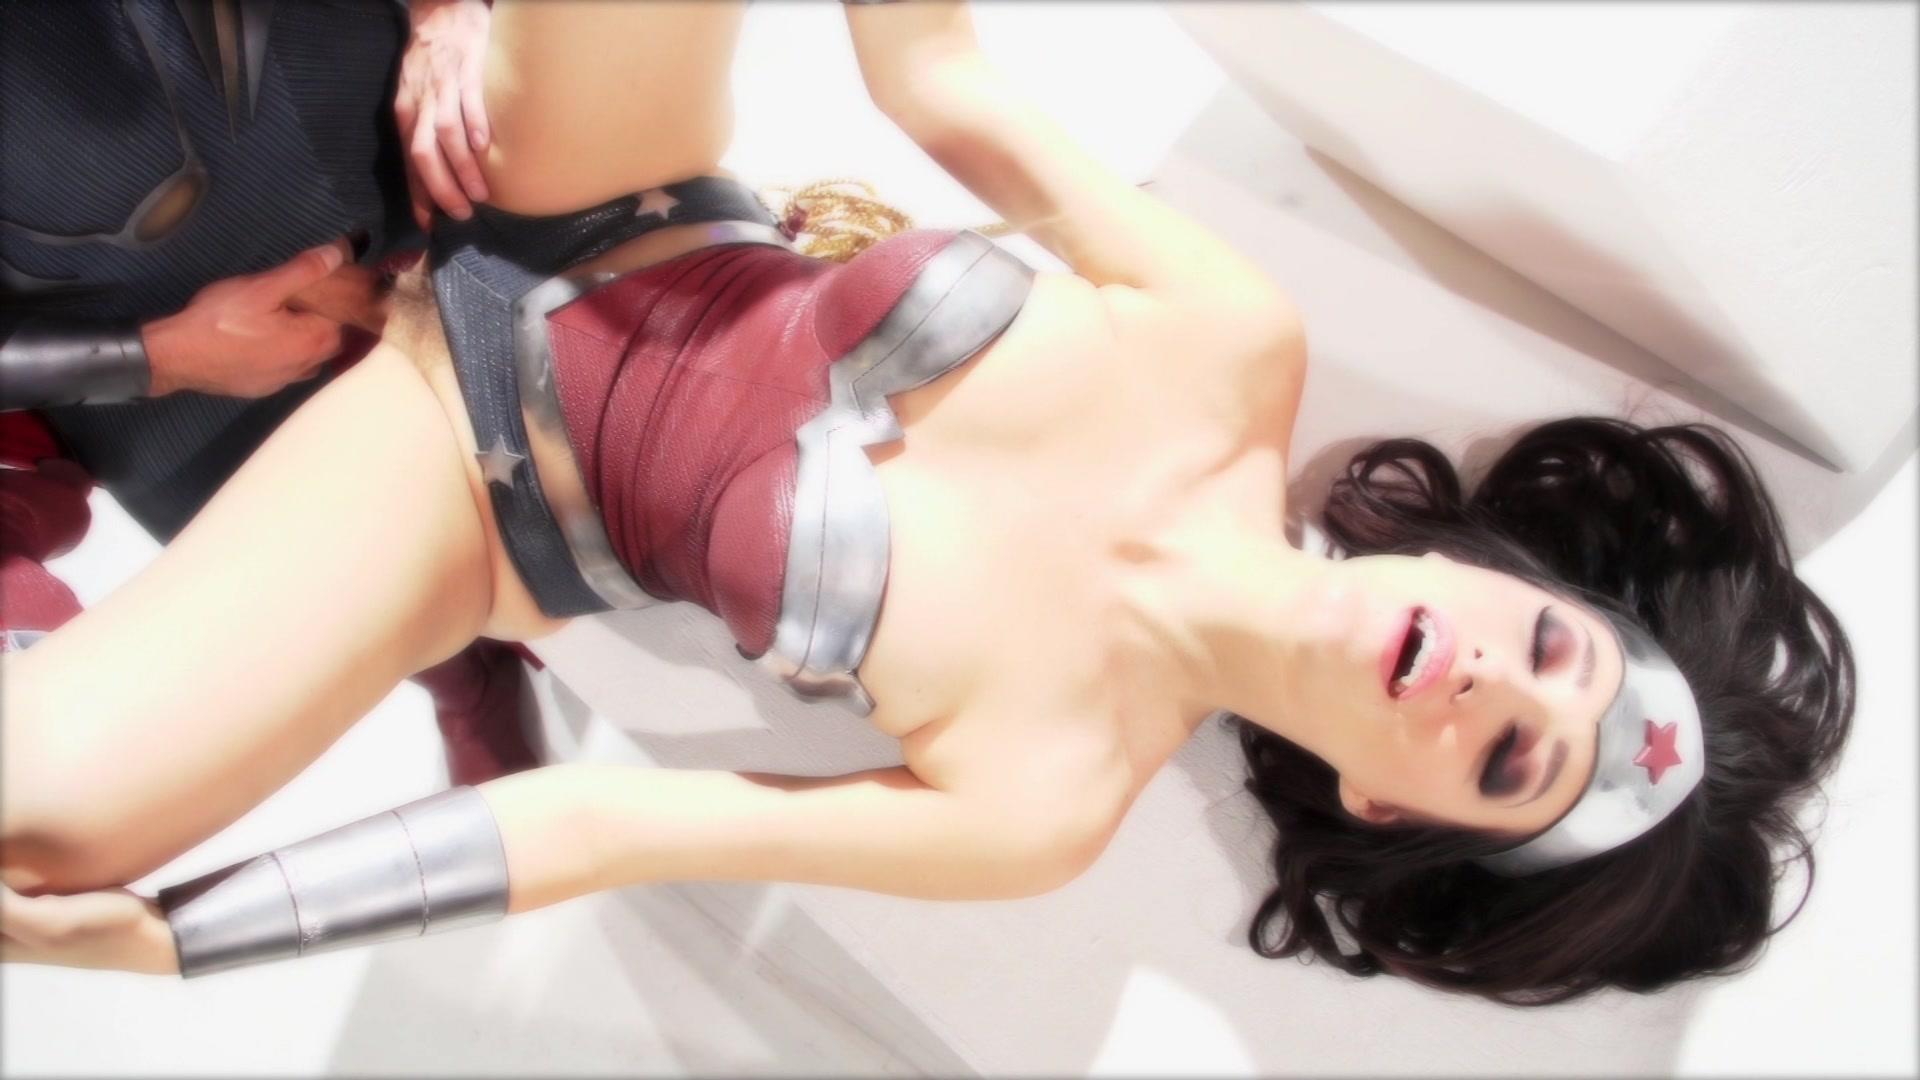 Wonder Woman Xxx An Axel Braun Parody 2015  Adult Empire-4244